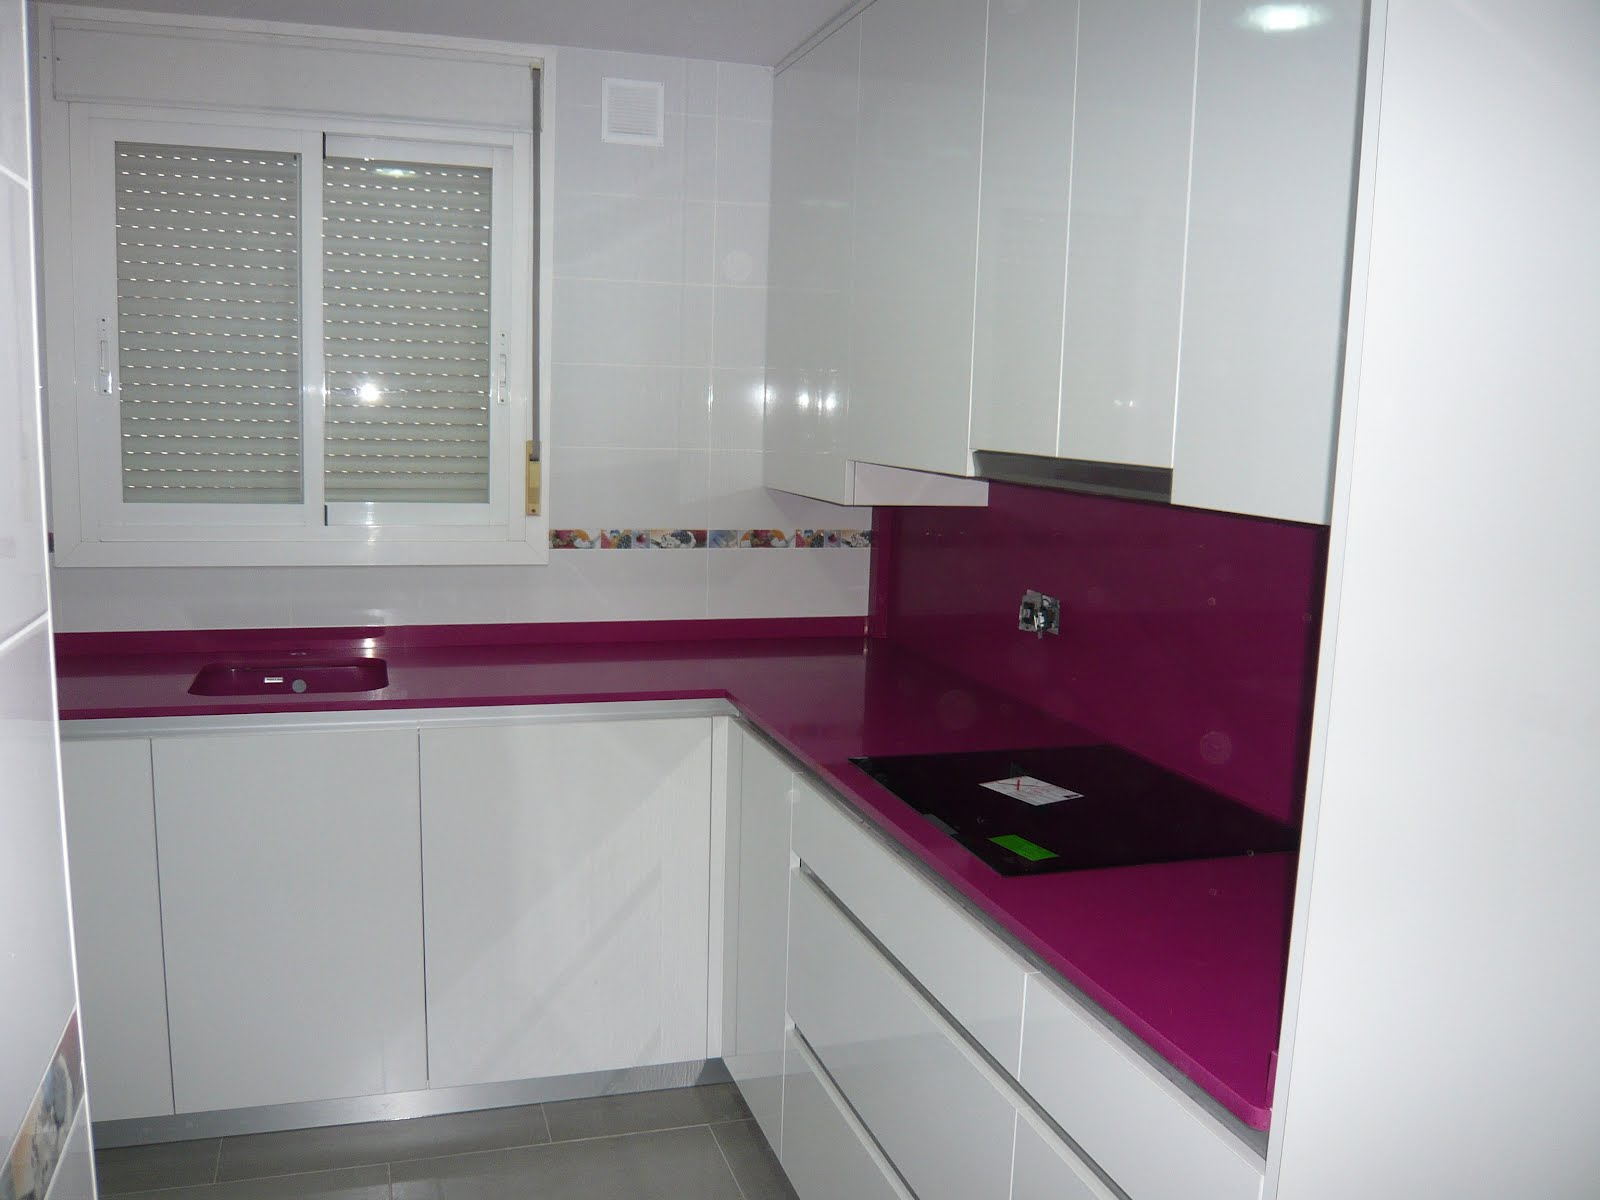 Reuscuina muebles de cocina con gola integrado y luces for Muebles altos de cocina